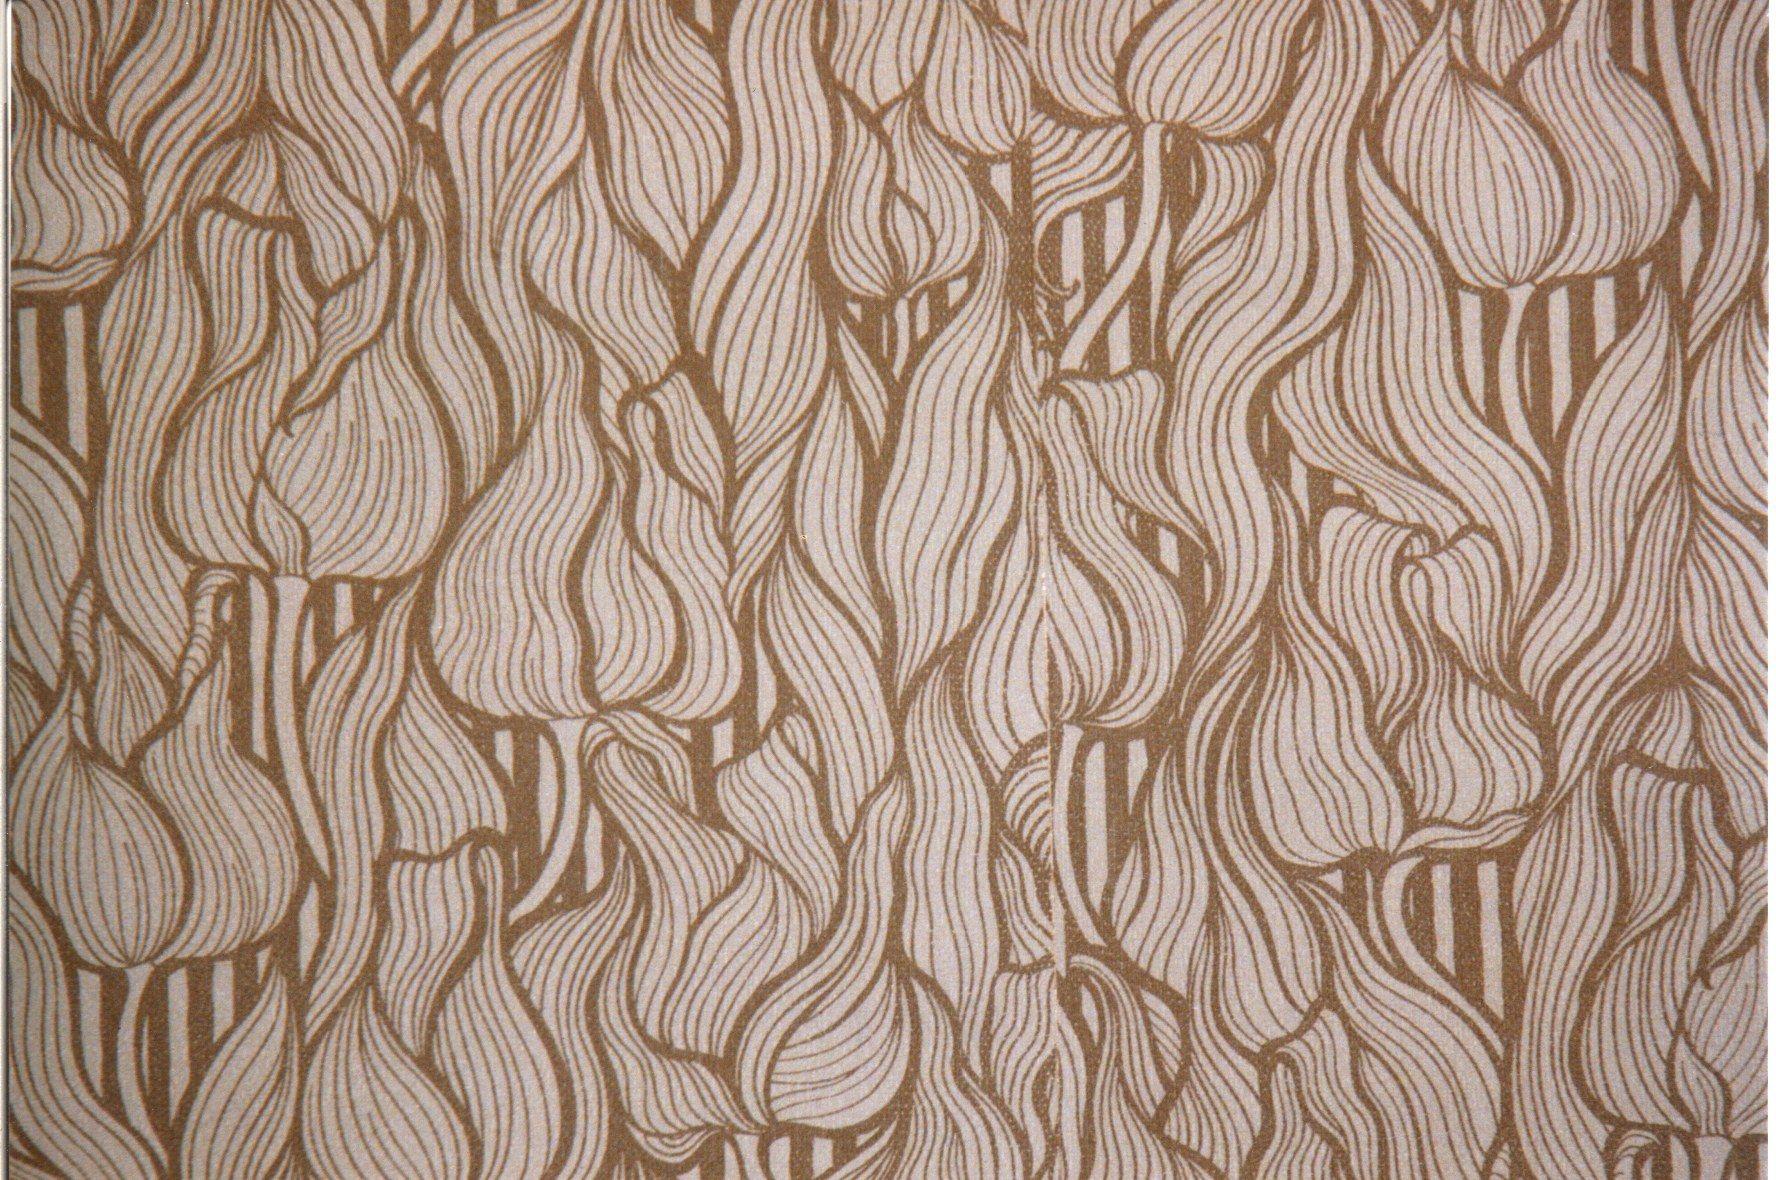 Wallpaper For Textured Walls 2015 Grasscloth Wallpaper